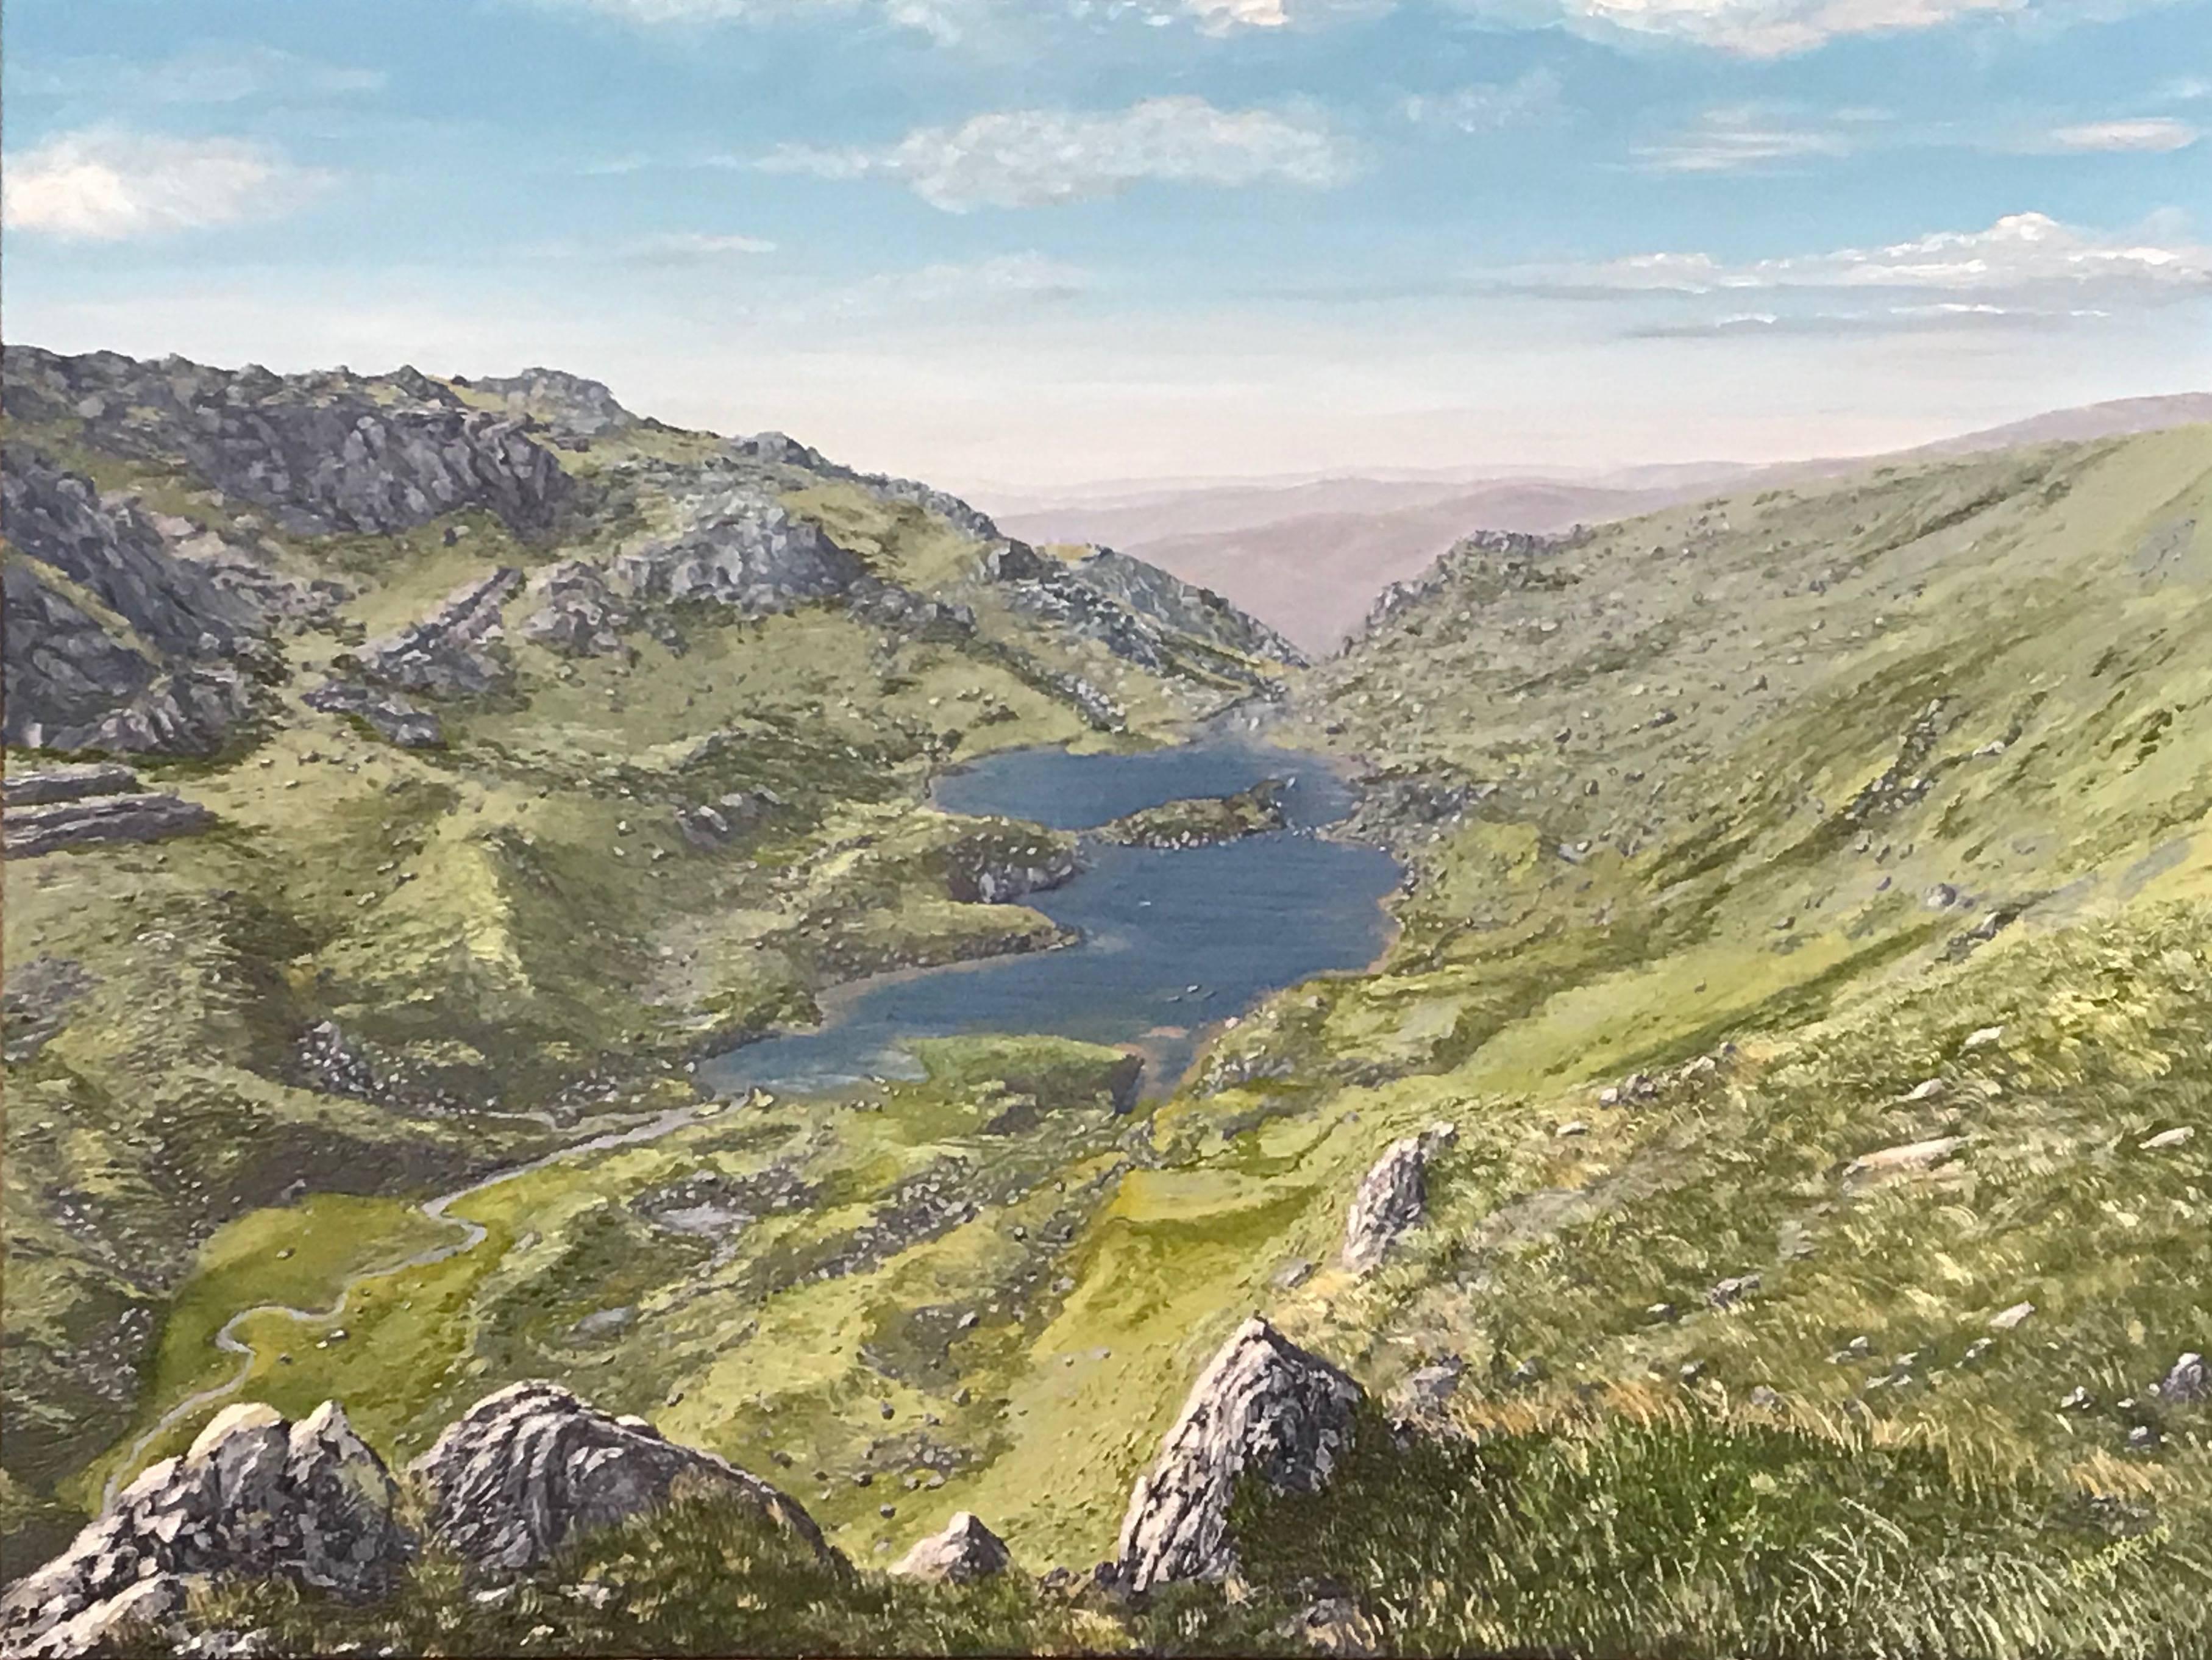 Kosciuszko National Park - Lake Albina